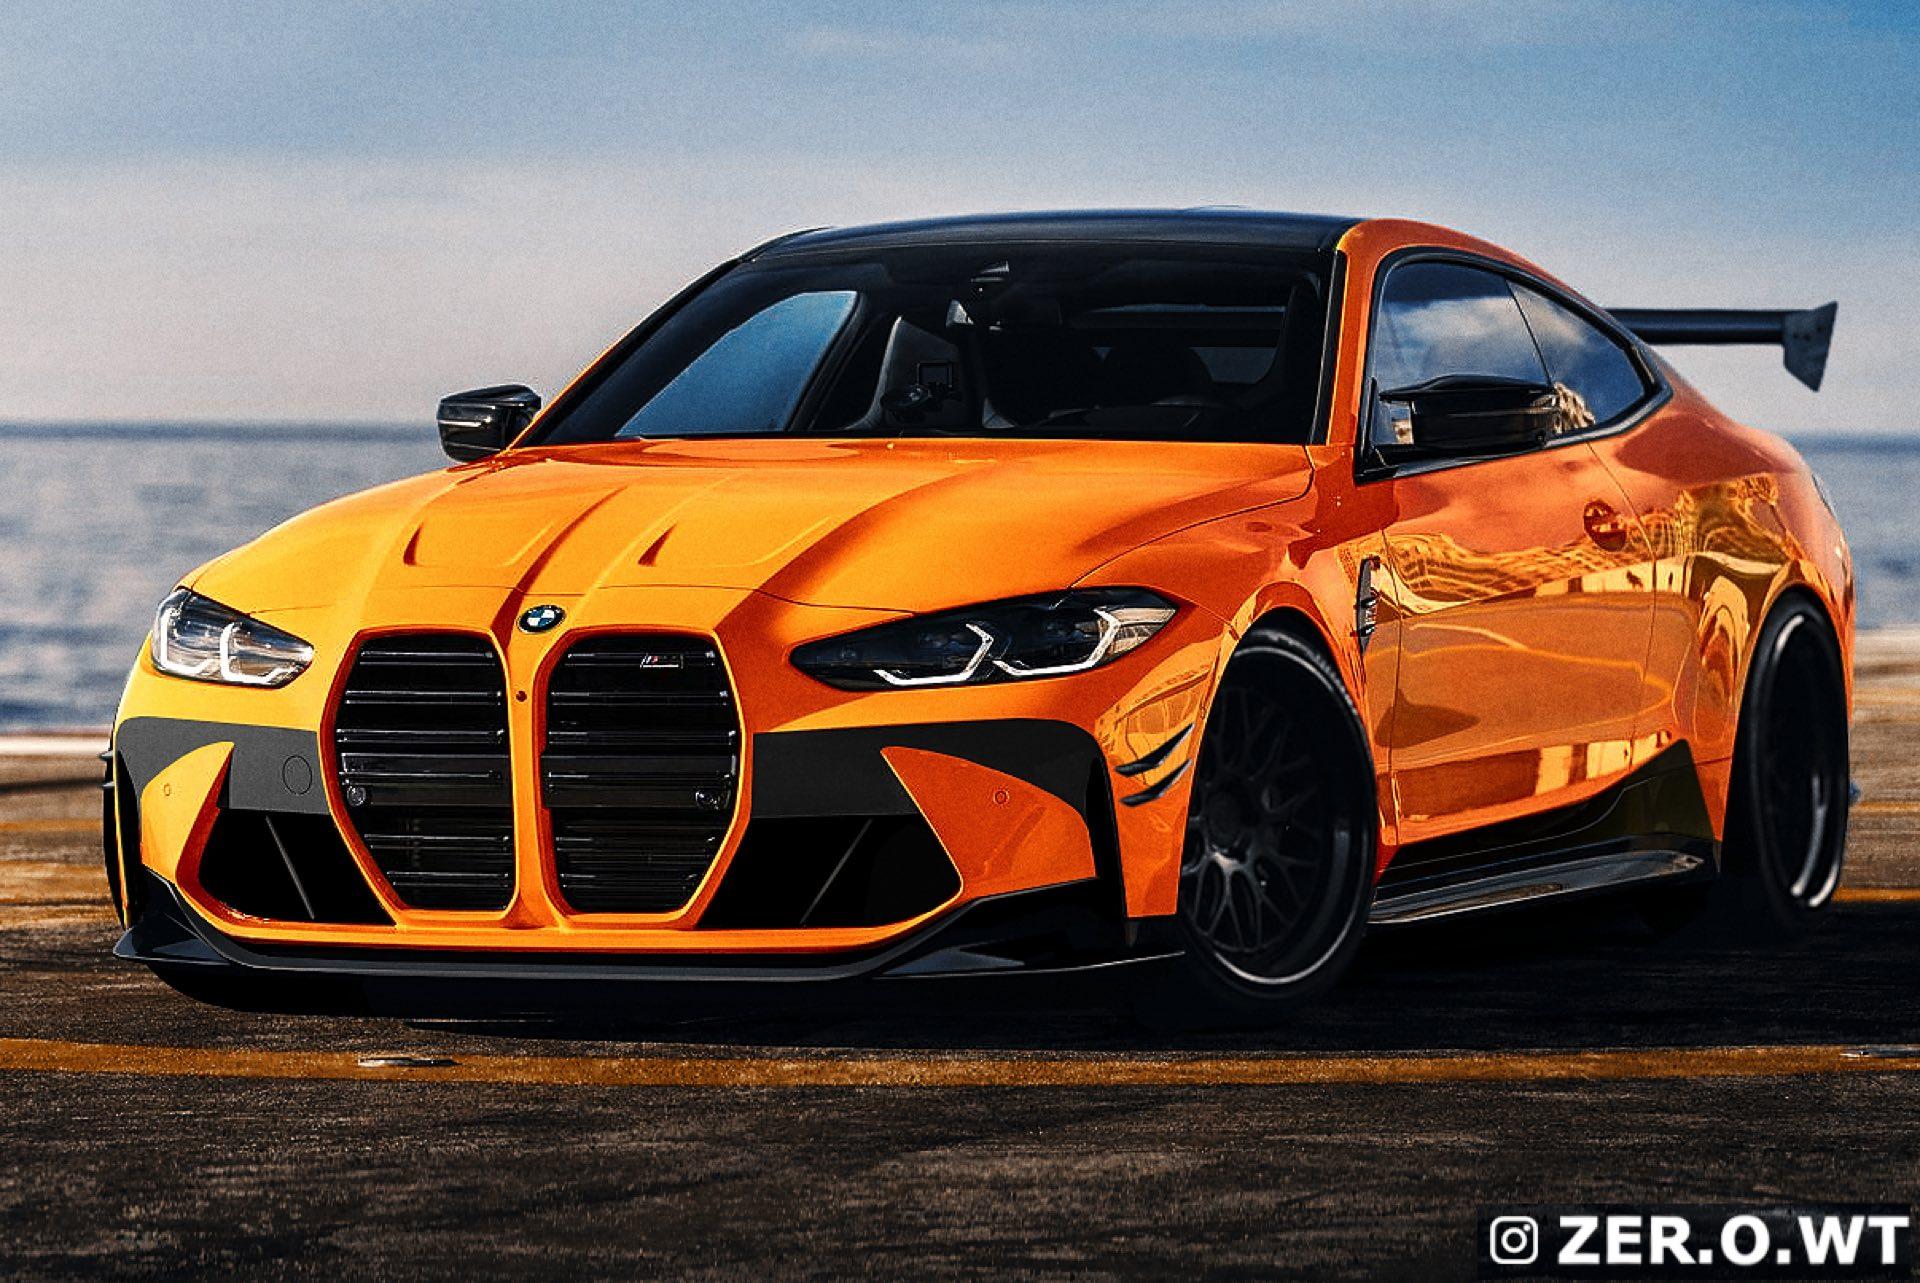 2021-BMW-M4-G82-Tuning-zero-wt-Feuerorange.jpg